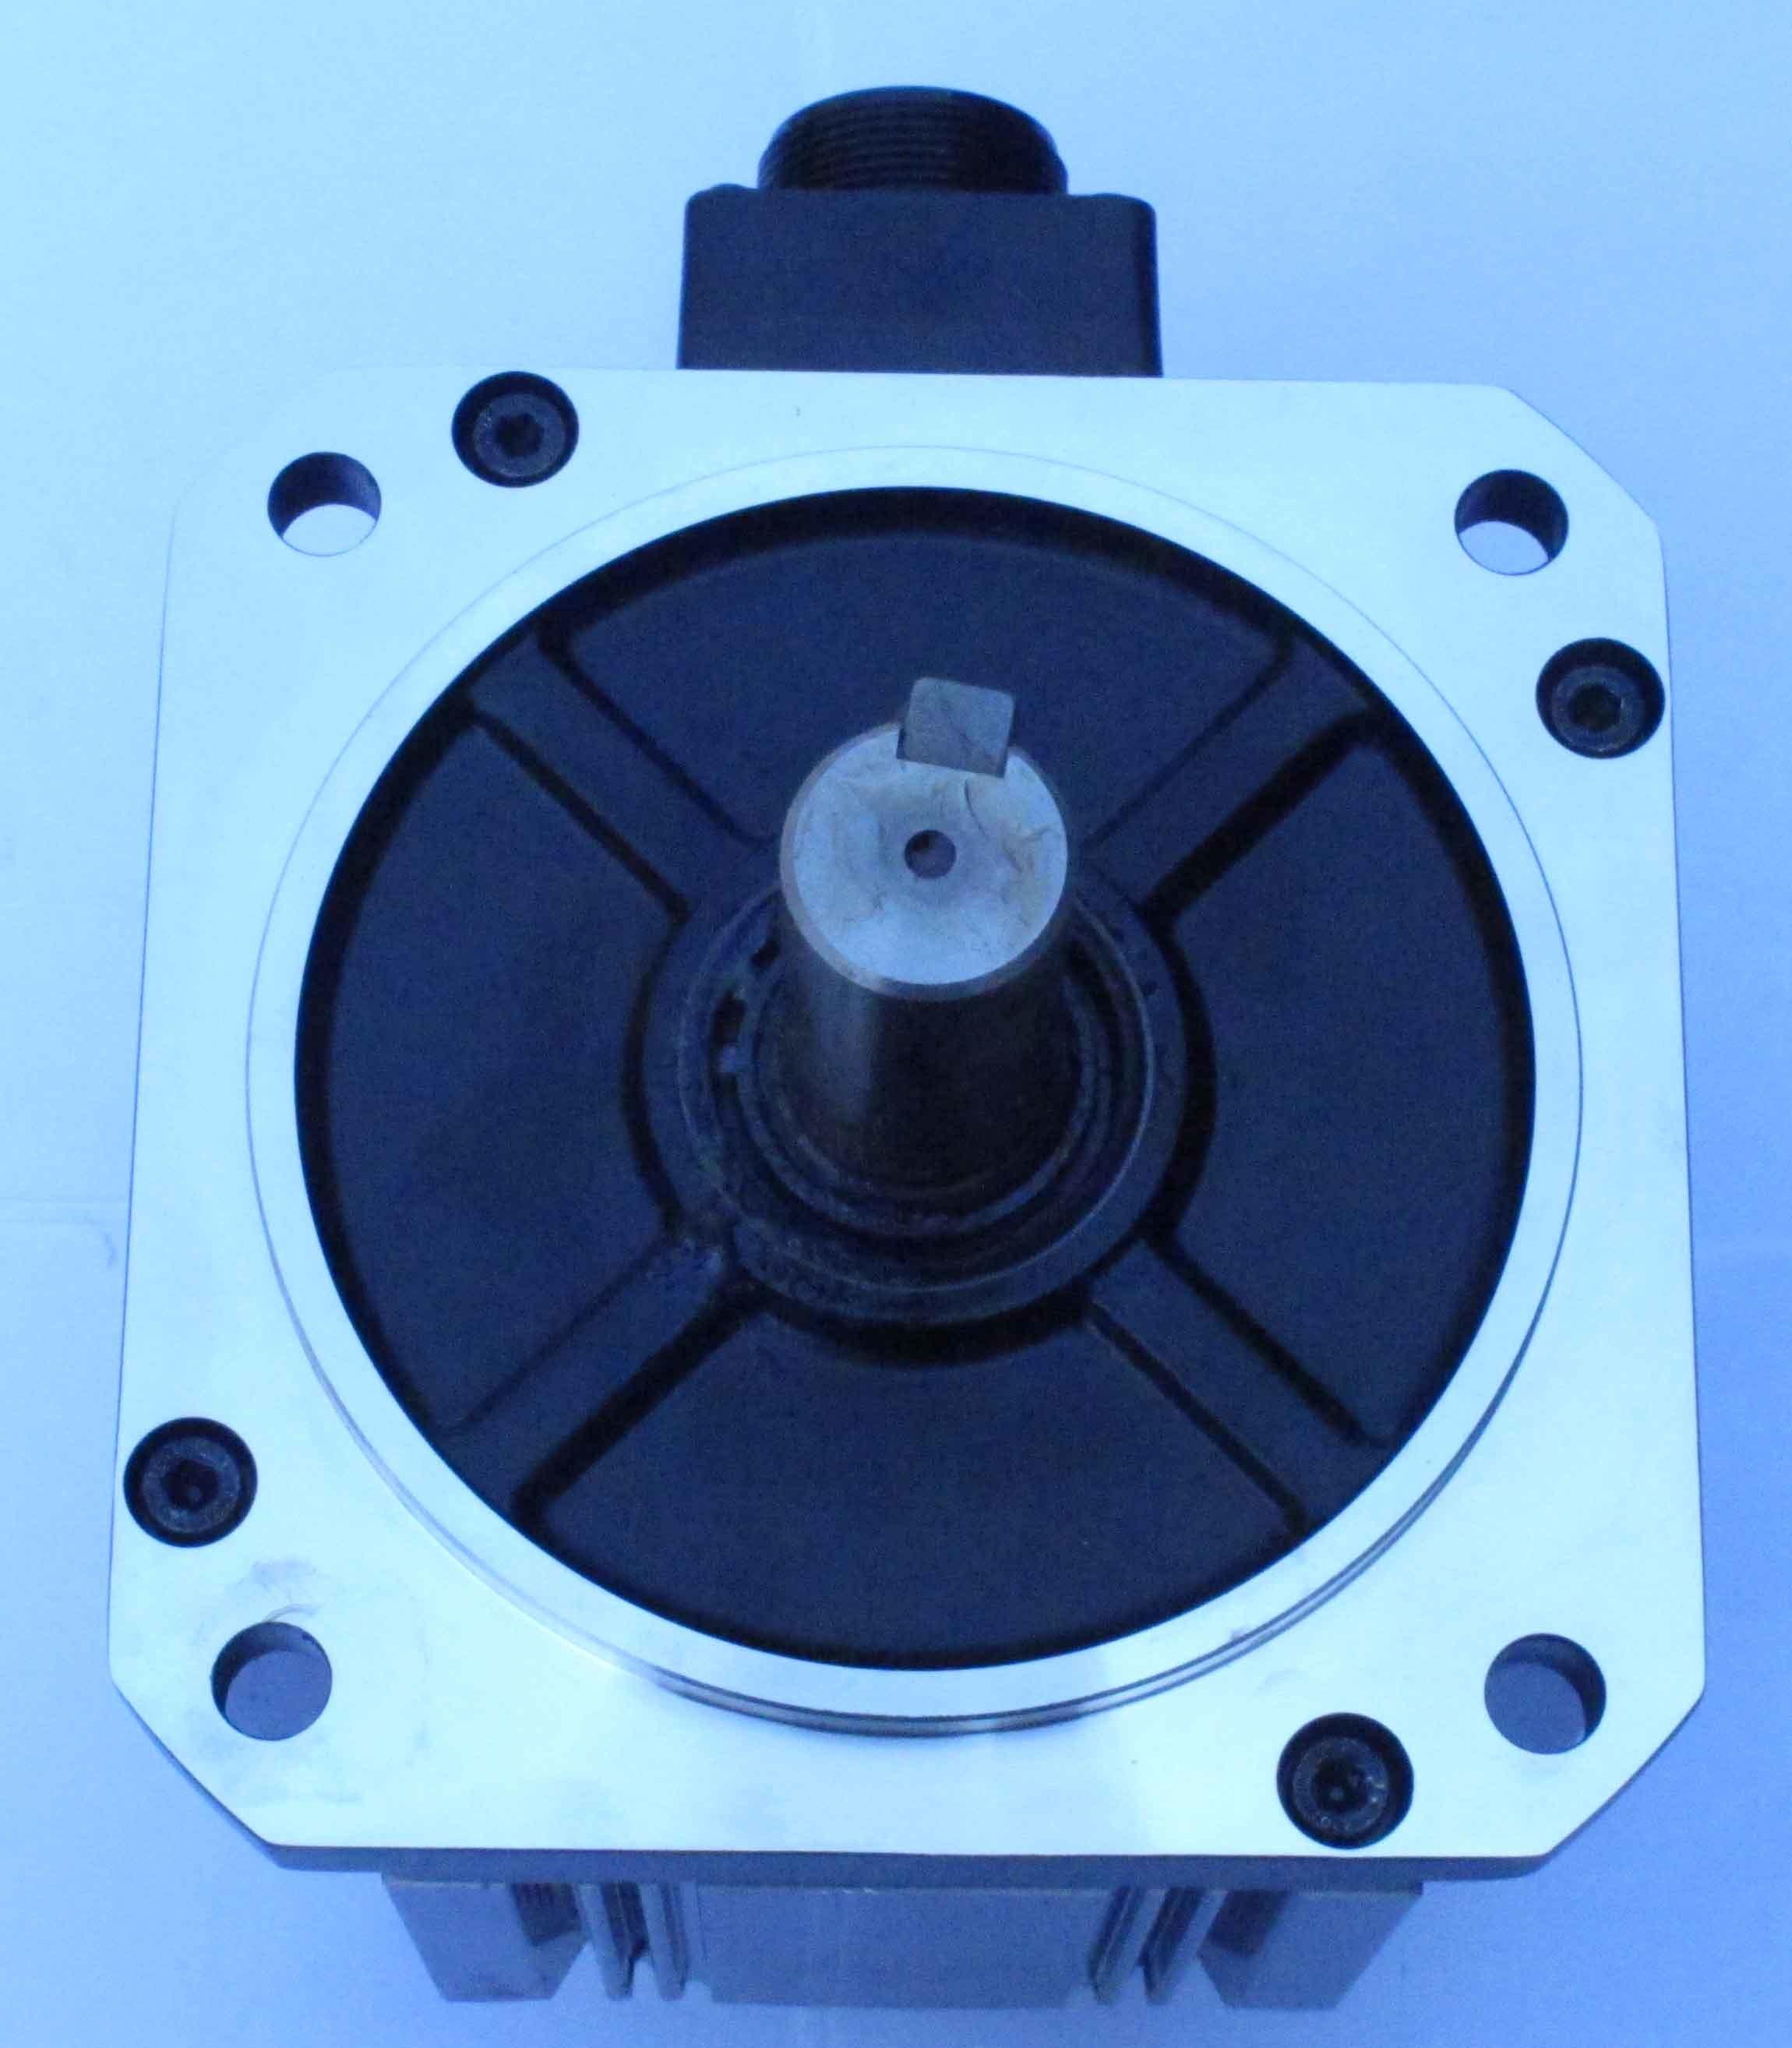 Ac permanent magnet synchronous motor photos pictures for Permanent magnet synchronous motor drive